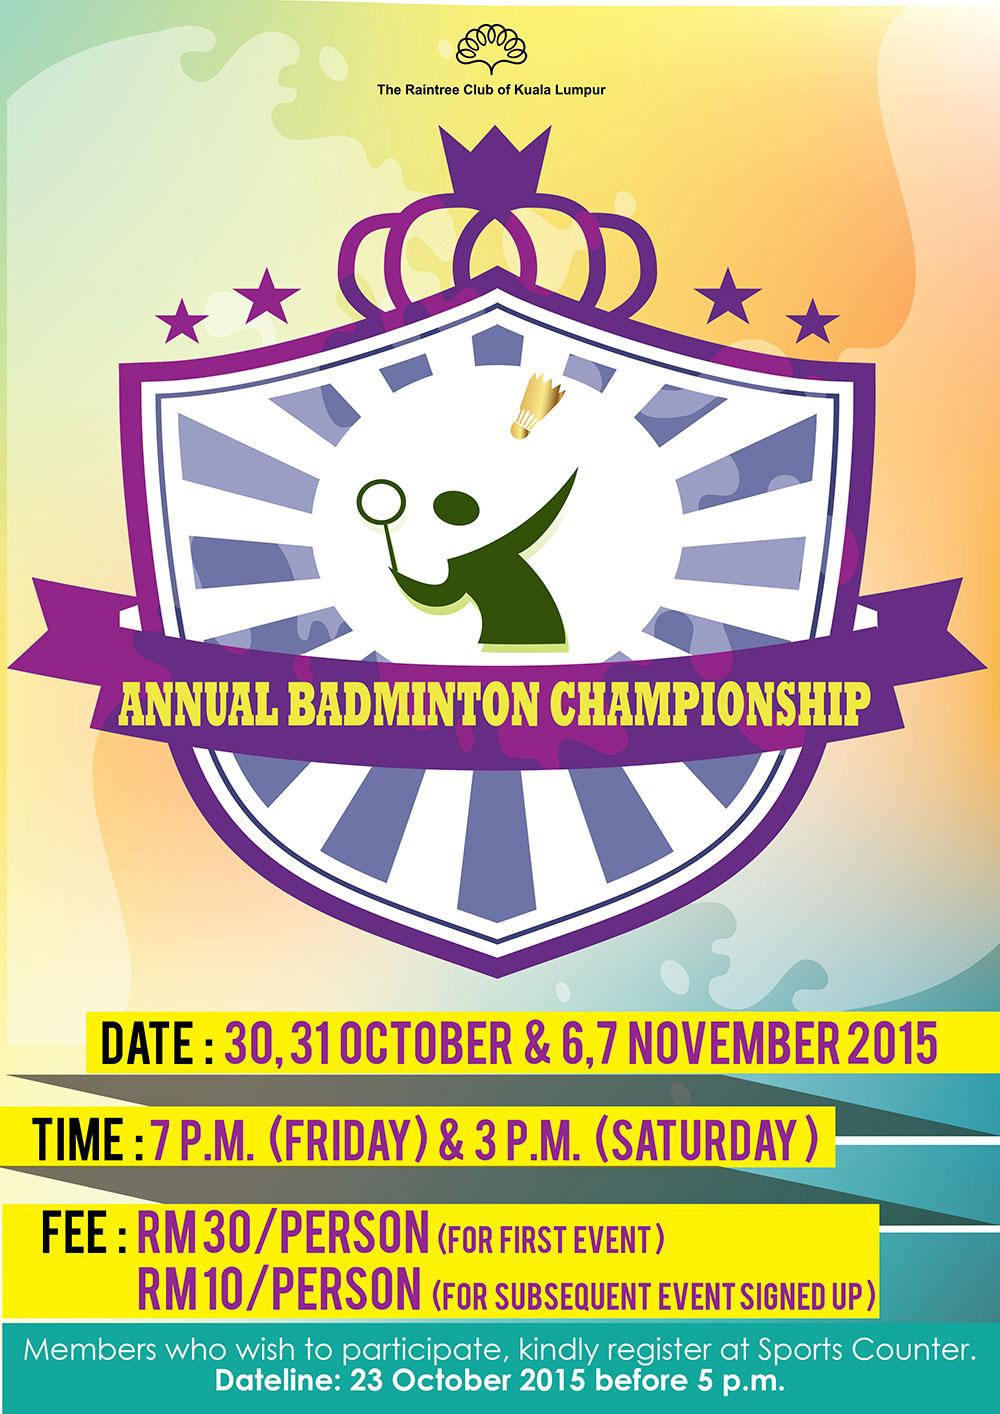 2_Annual-Badminton-Championship-2015-01